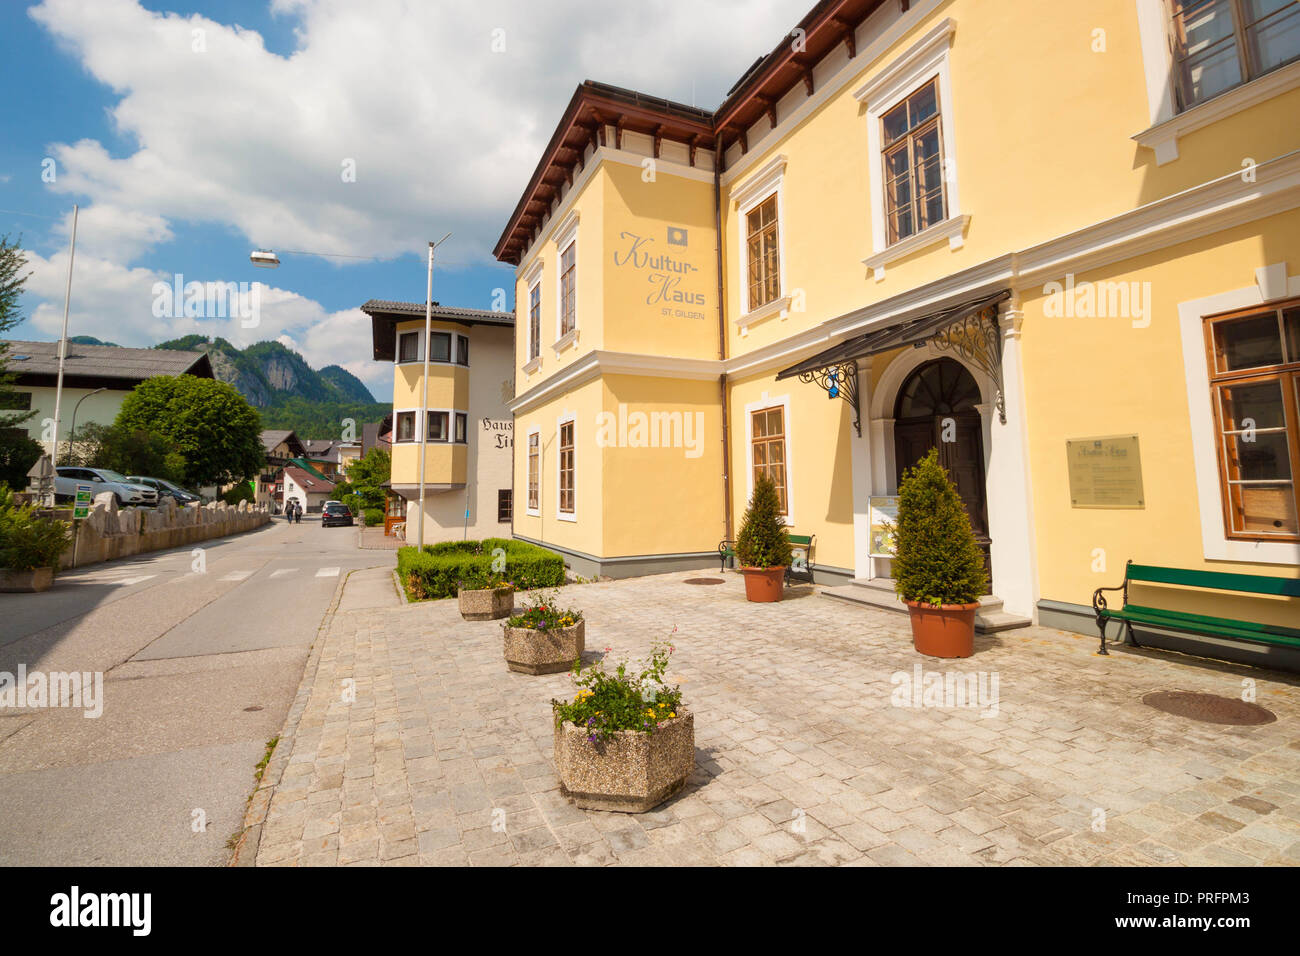 St. Gilgen, Austria - May 31, 2017: House of culture in alpine village St. Gilgen, Austria - Stock Image